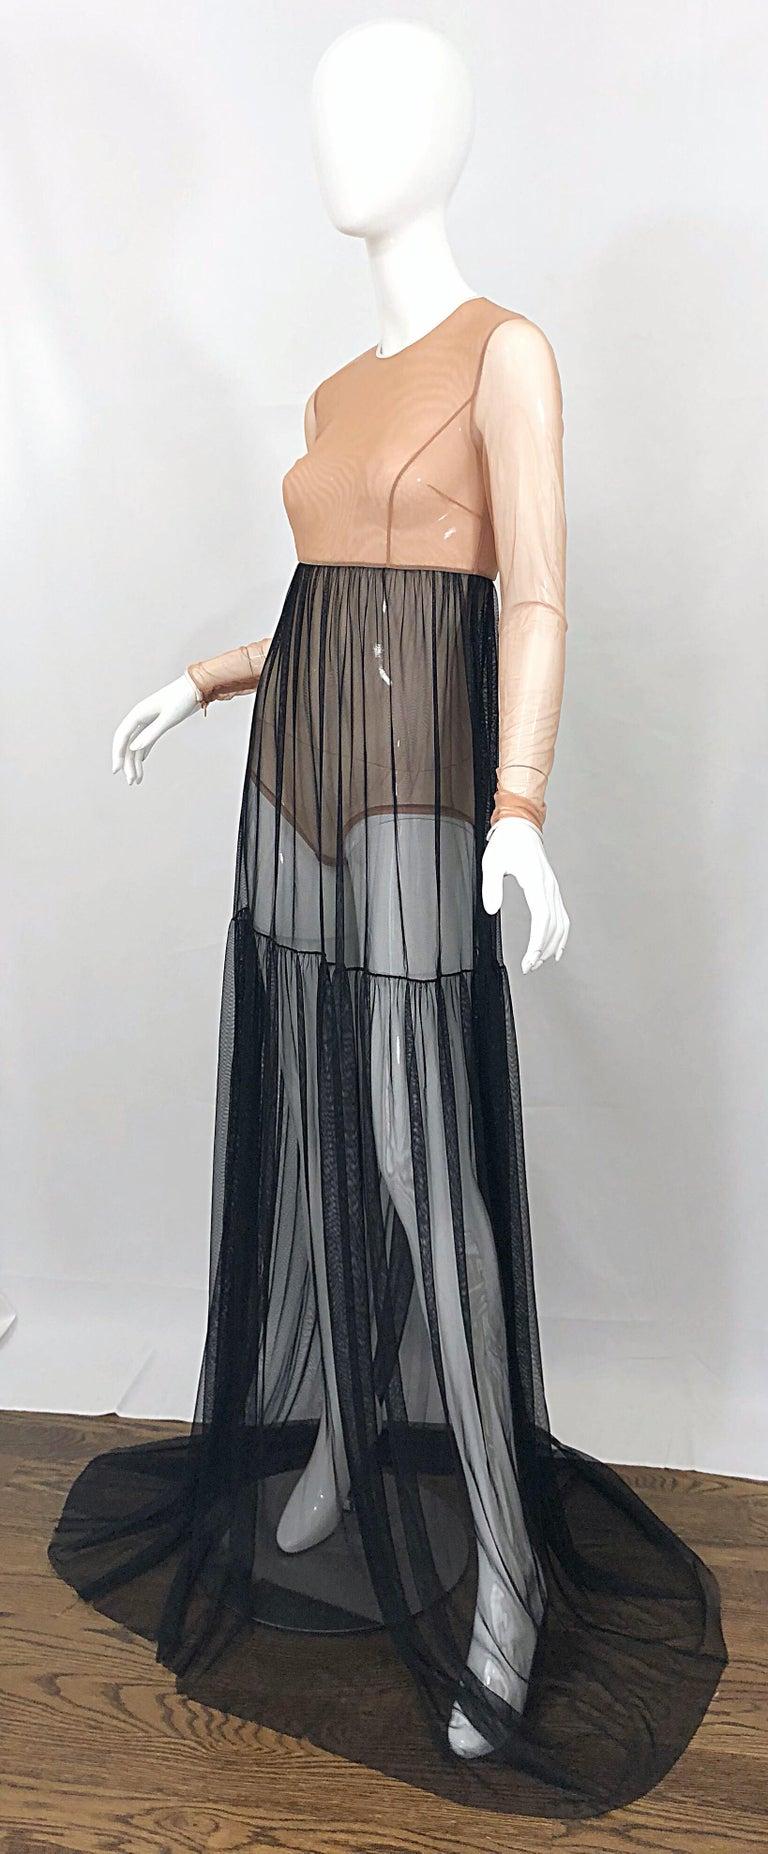 Michael Kors Collection Sz 4 Nude + Black Sheer Runway Mesh Bodysuit Gown Dress For Sale 1